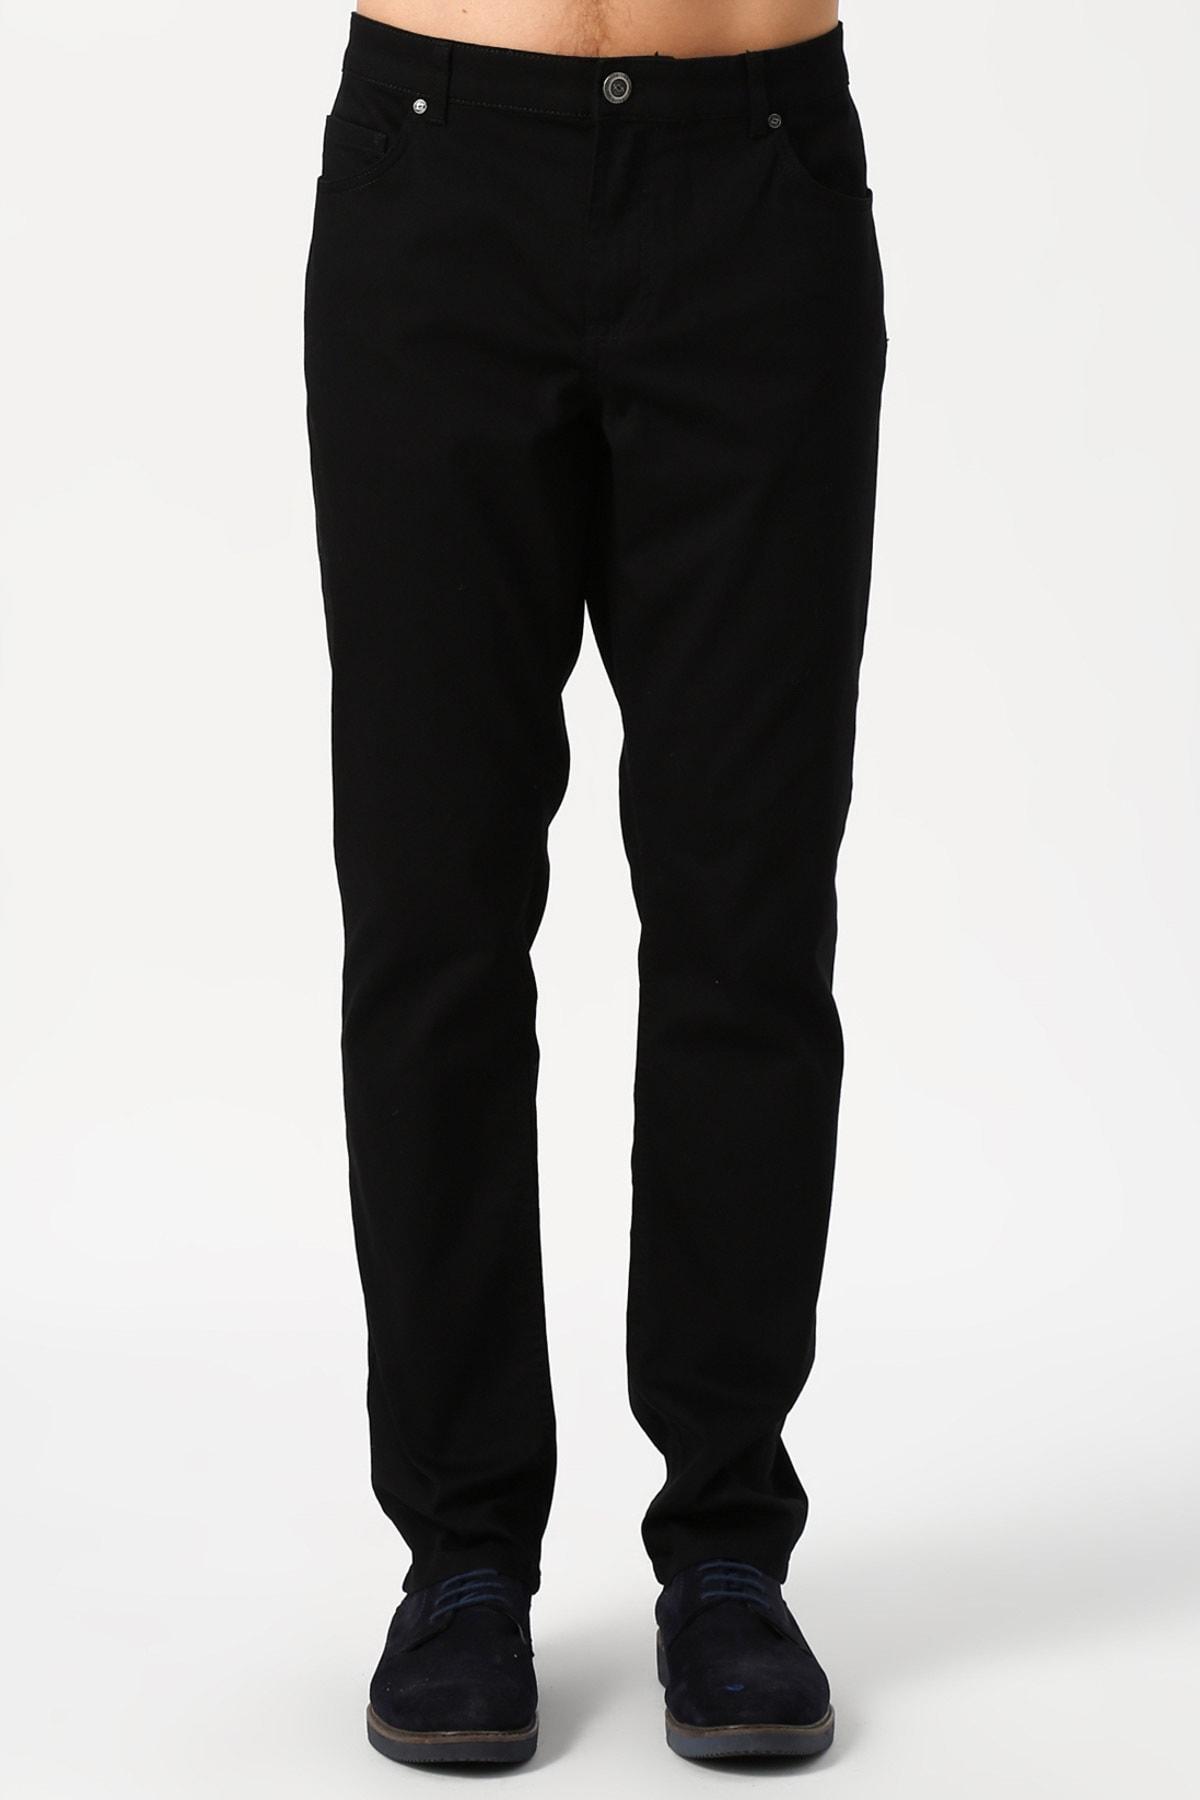 Fabrika Klasik Pantolon 2